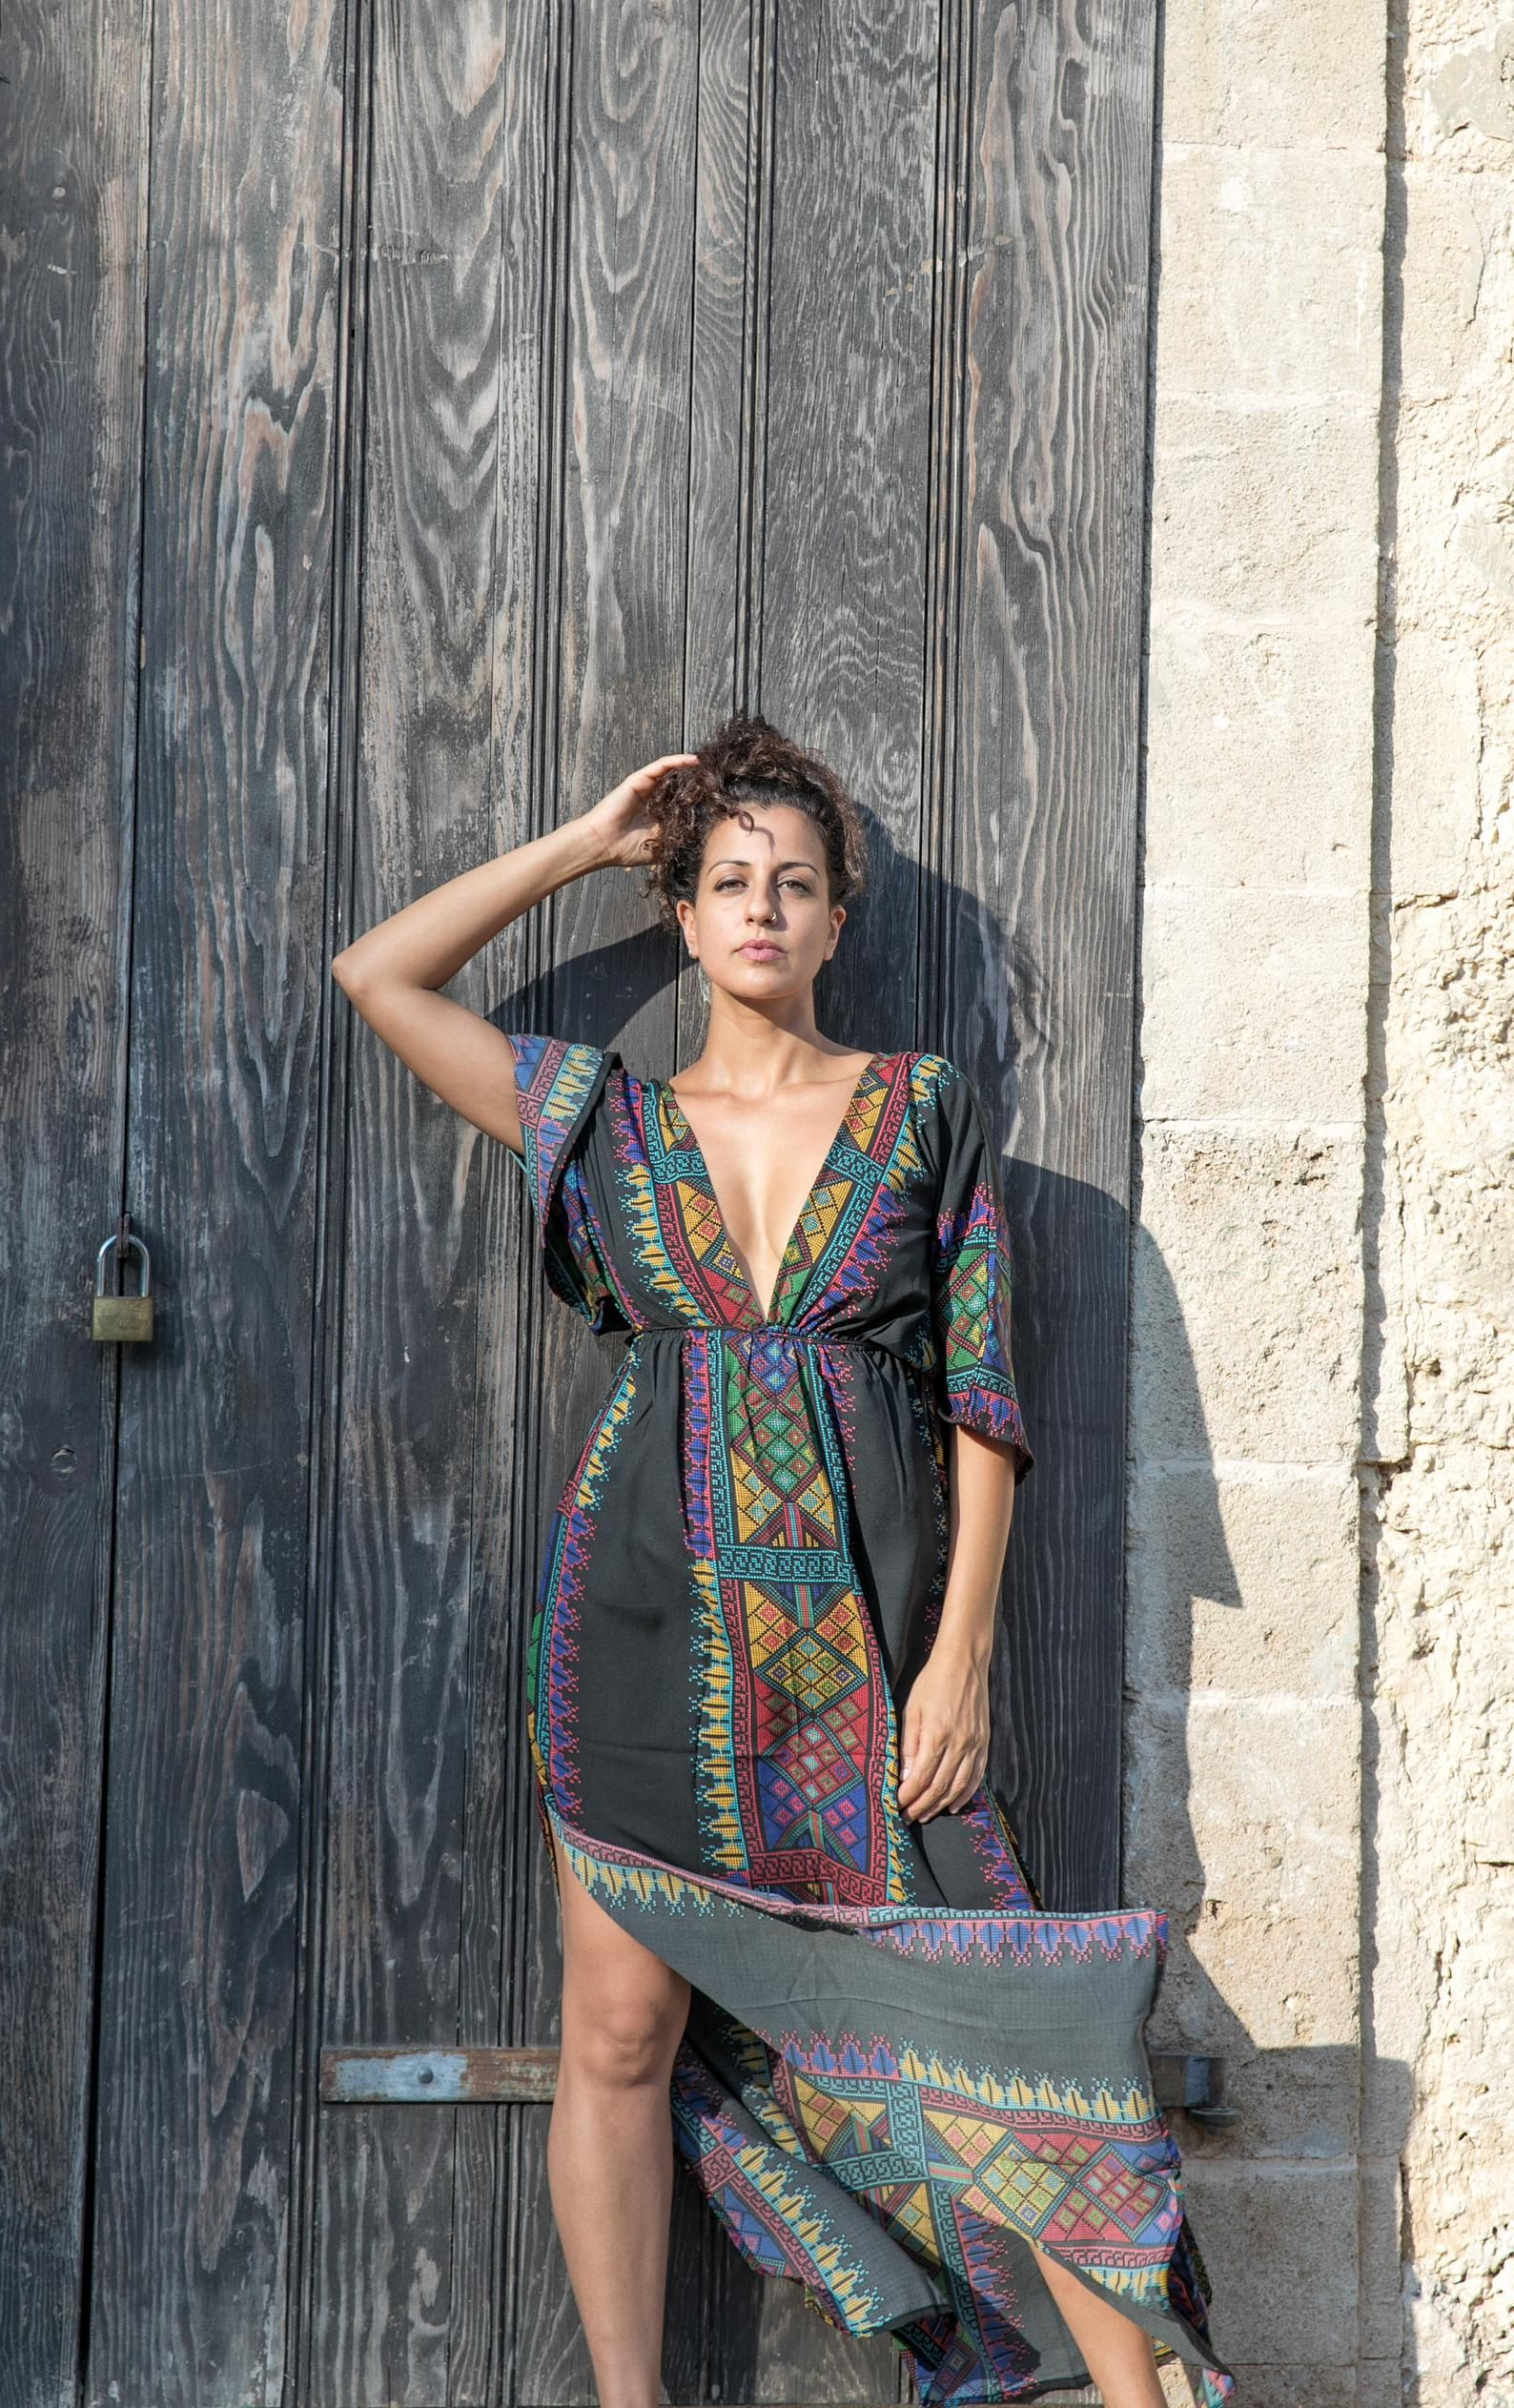 Desert Wind Dress Boho Maxi Dress Kaftan Long Dress Open Back Maxi Dress Dress With Sleeves Boho Maxi Dress Boho Dress Elegant Summer Dresses [ 2526 x 1588 Pixel ]